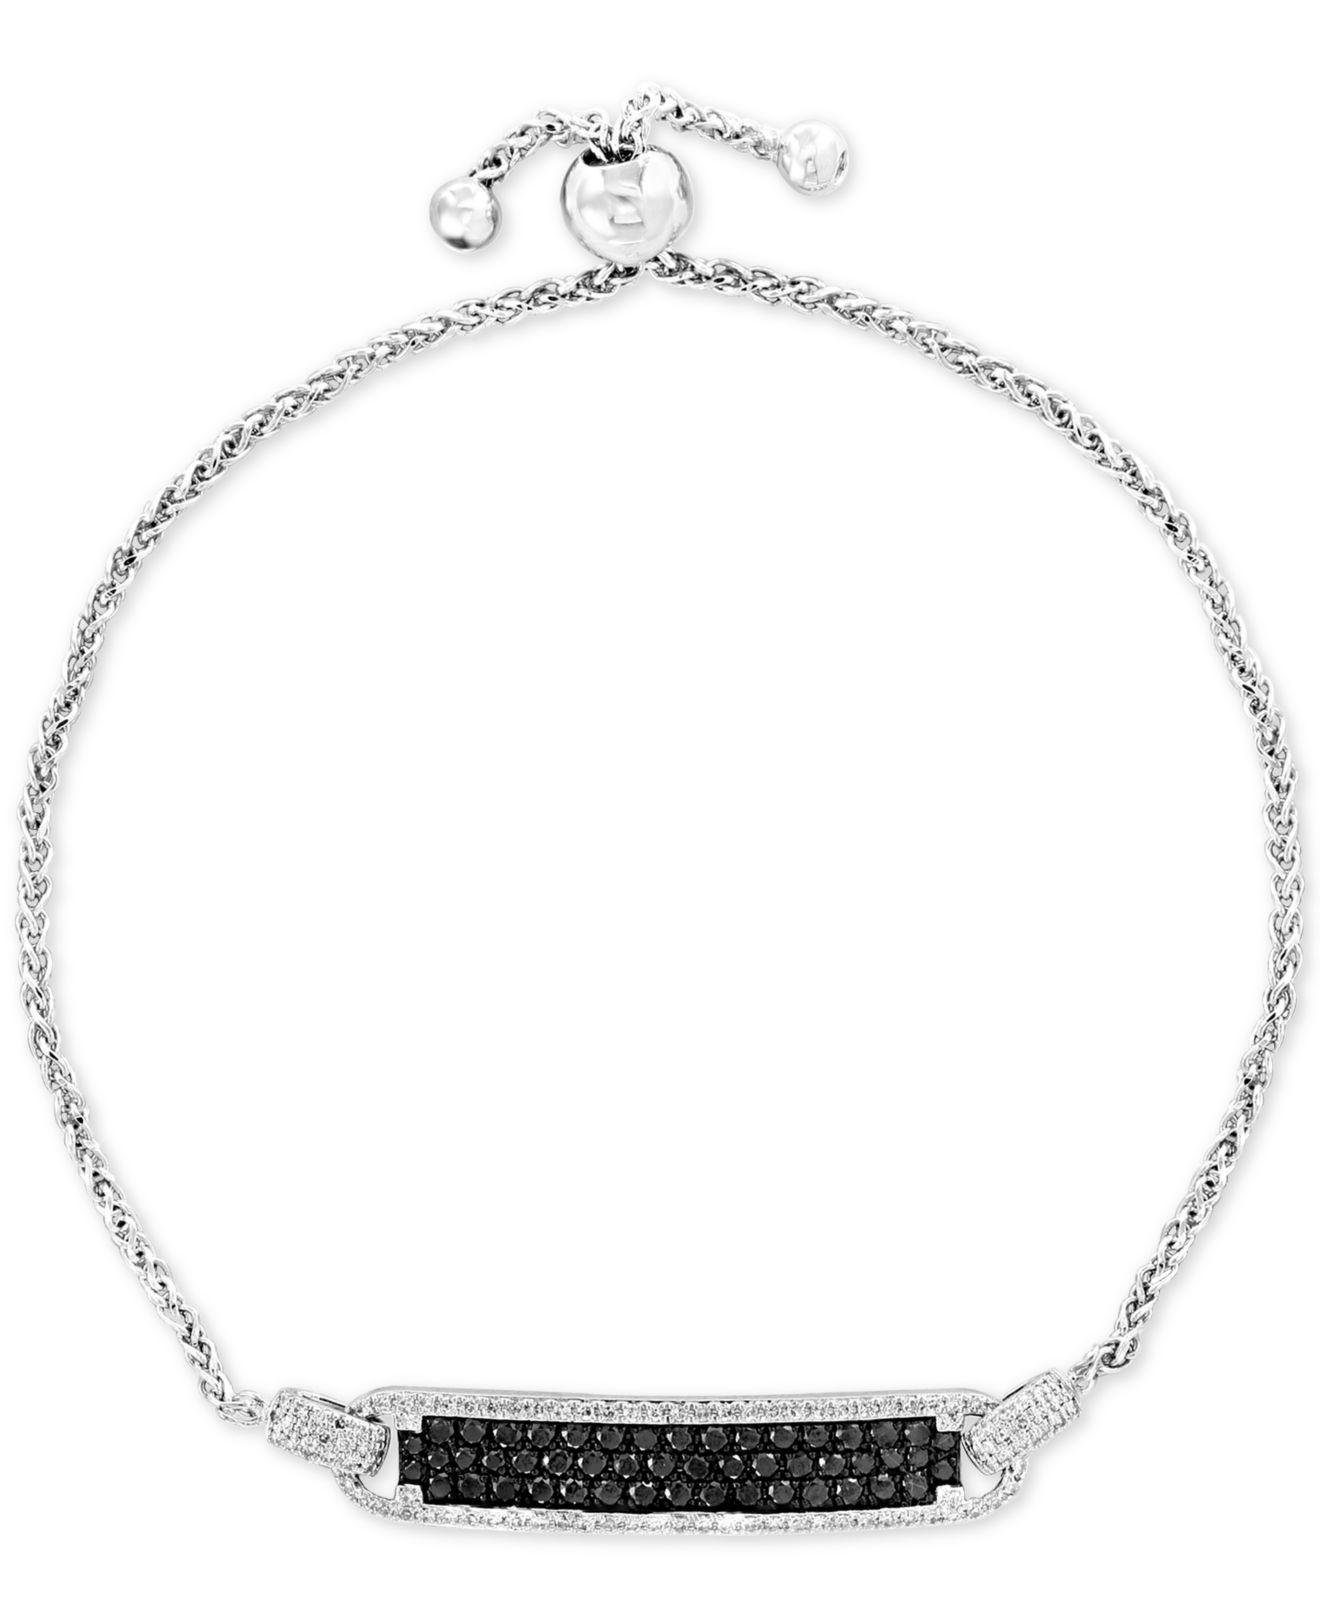 91bddfb5251177 Lyst - Effy Collection Effy® Diamond Bolo Bracelet (1 Ct. T.w.) In ...